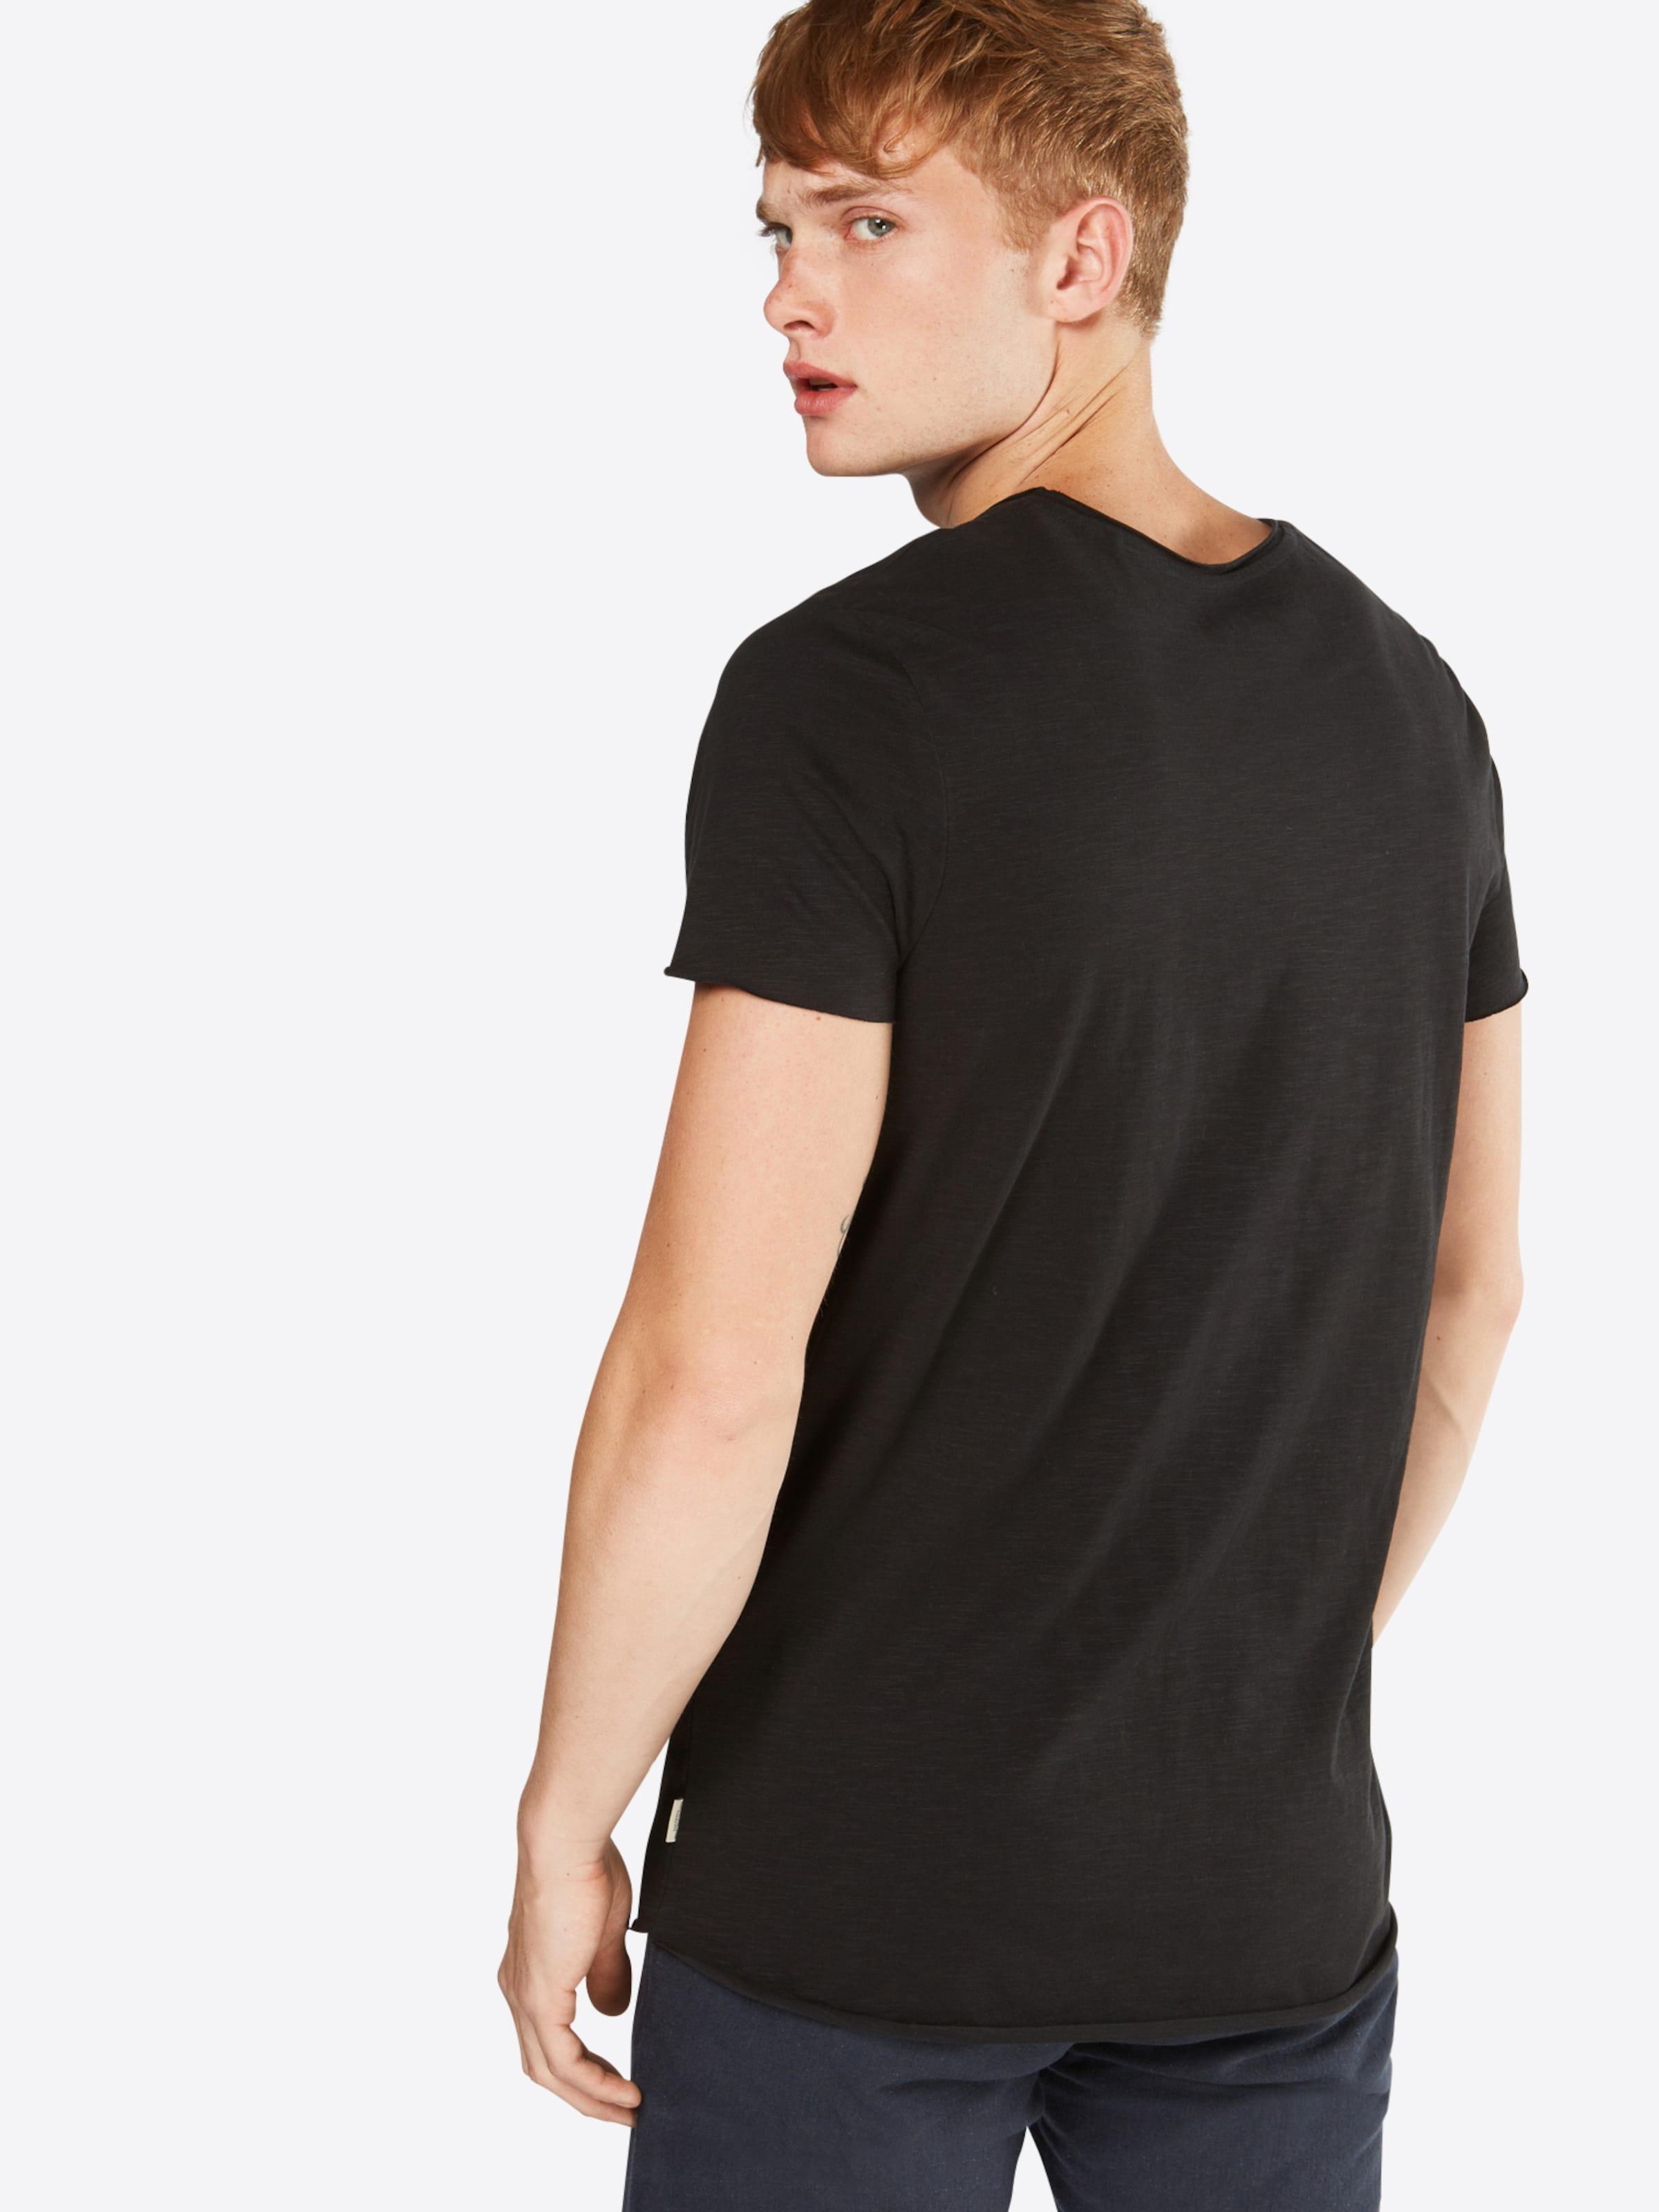 Jackamp; Tee neck Jones U shirt Noos' En Noir T 'jjebas Ss sQhrCtd